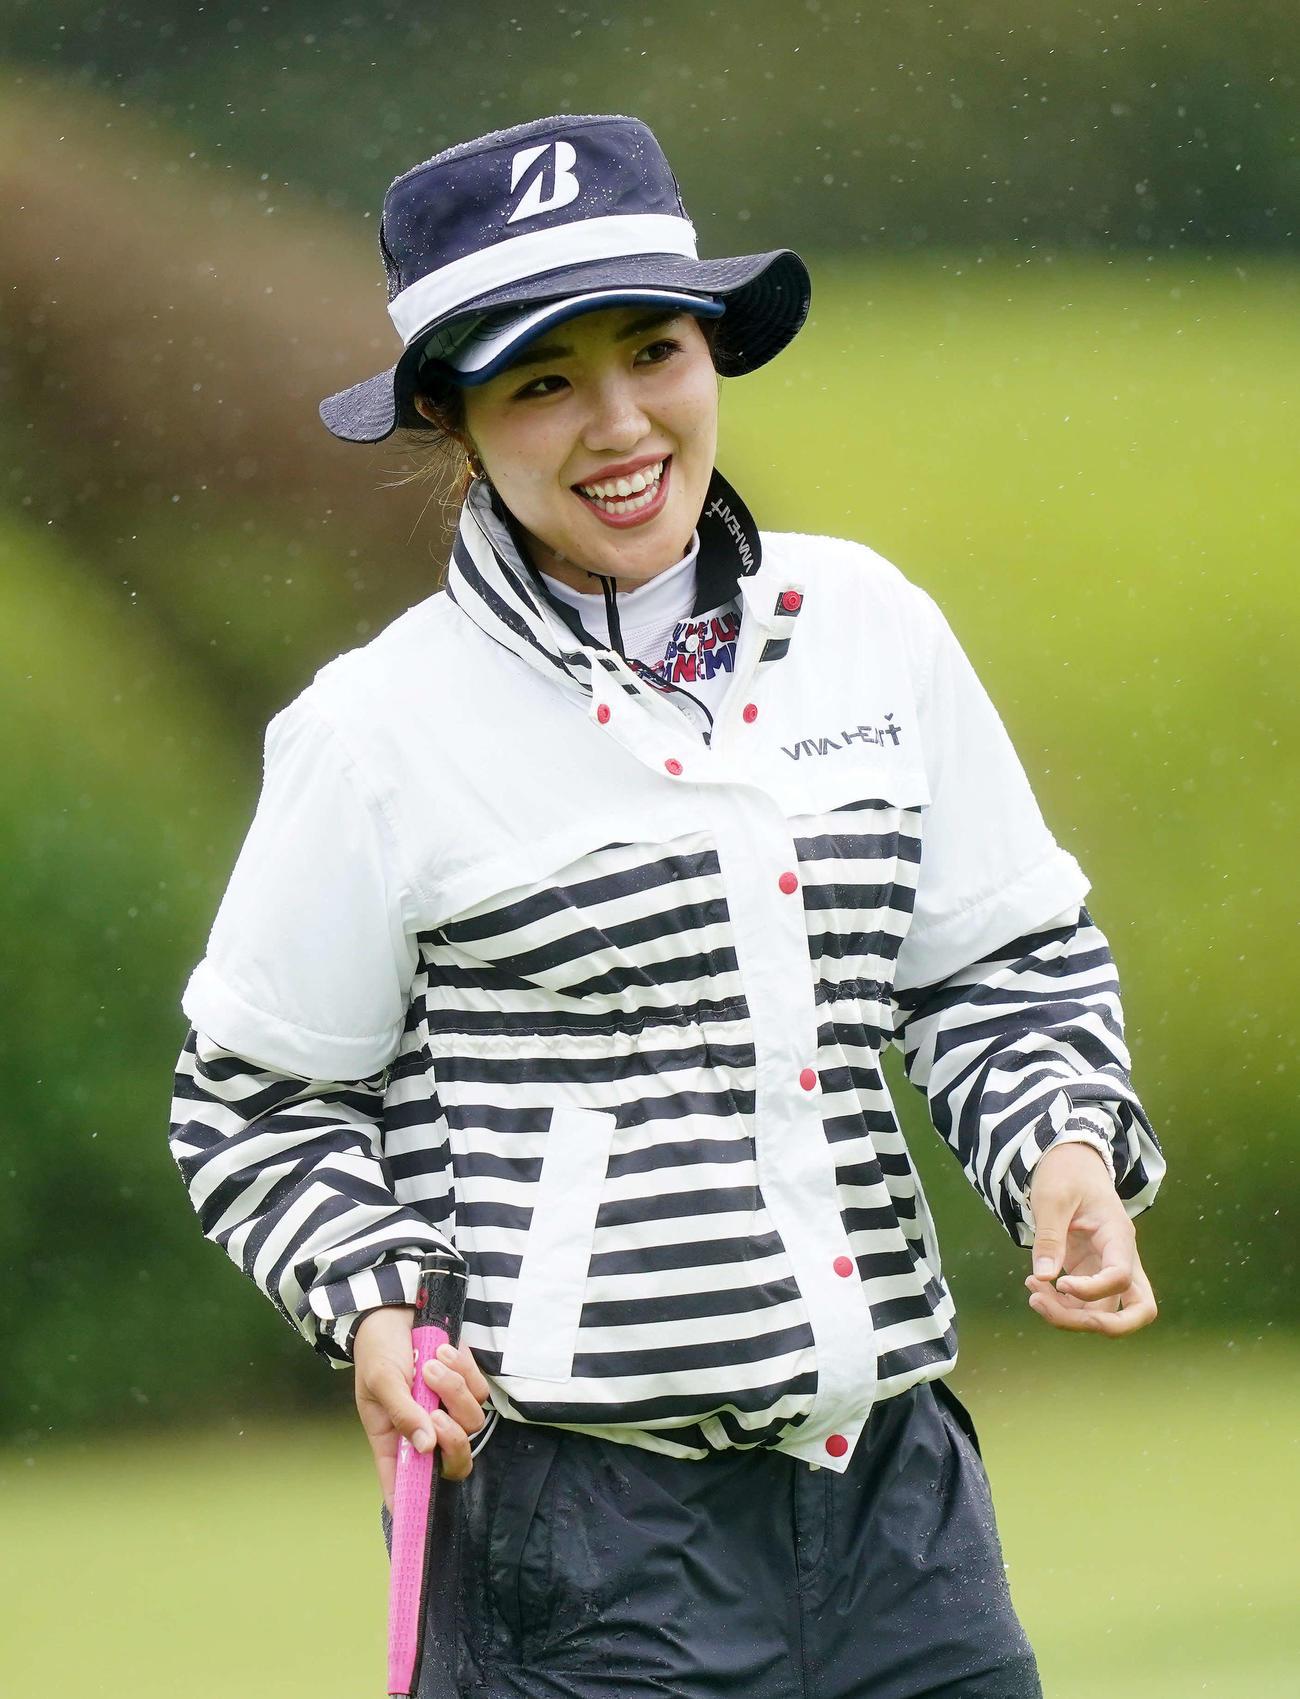 https://www.nikkansports.com/sports/golf/news/img/202010150000292-w1300_0.jpg